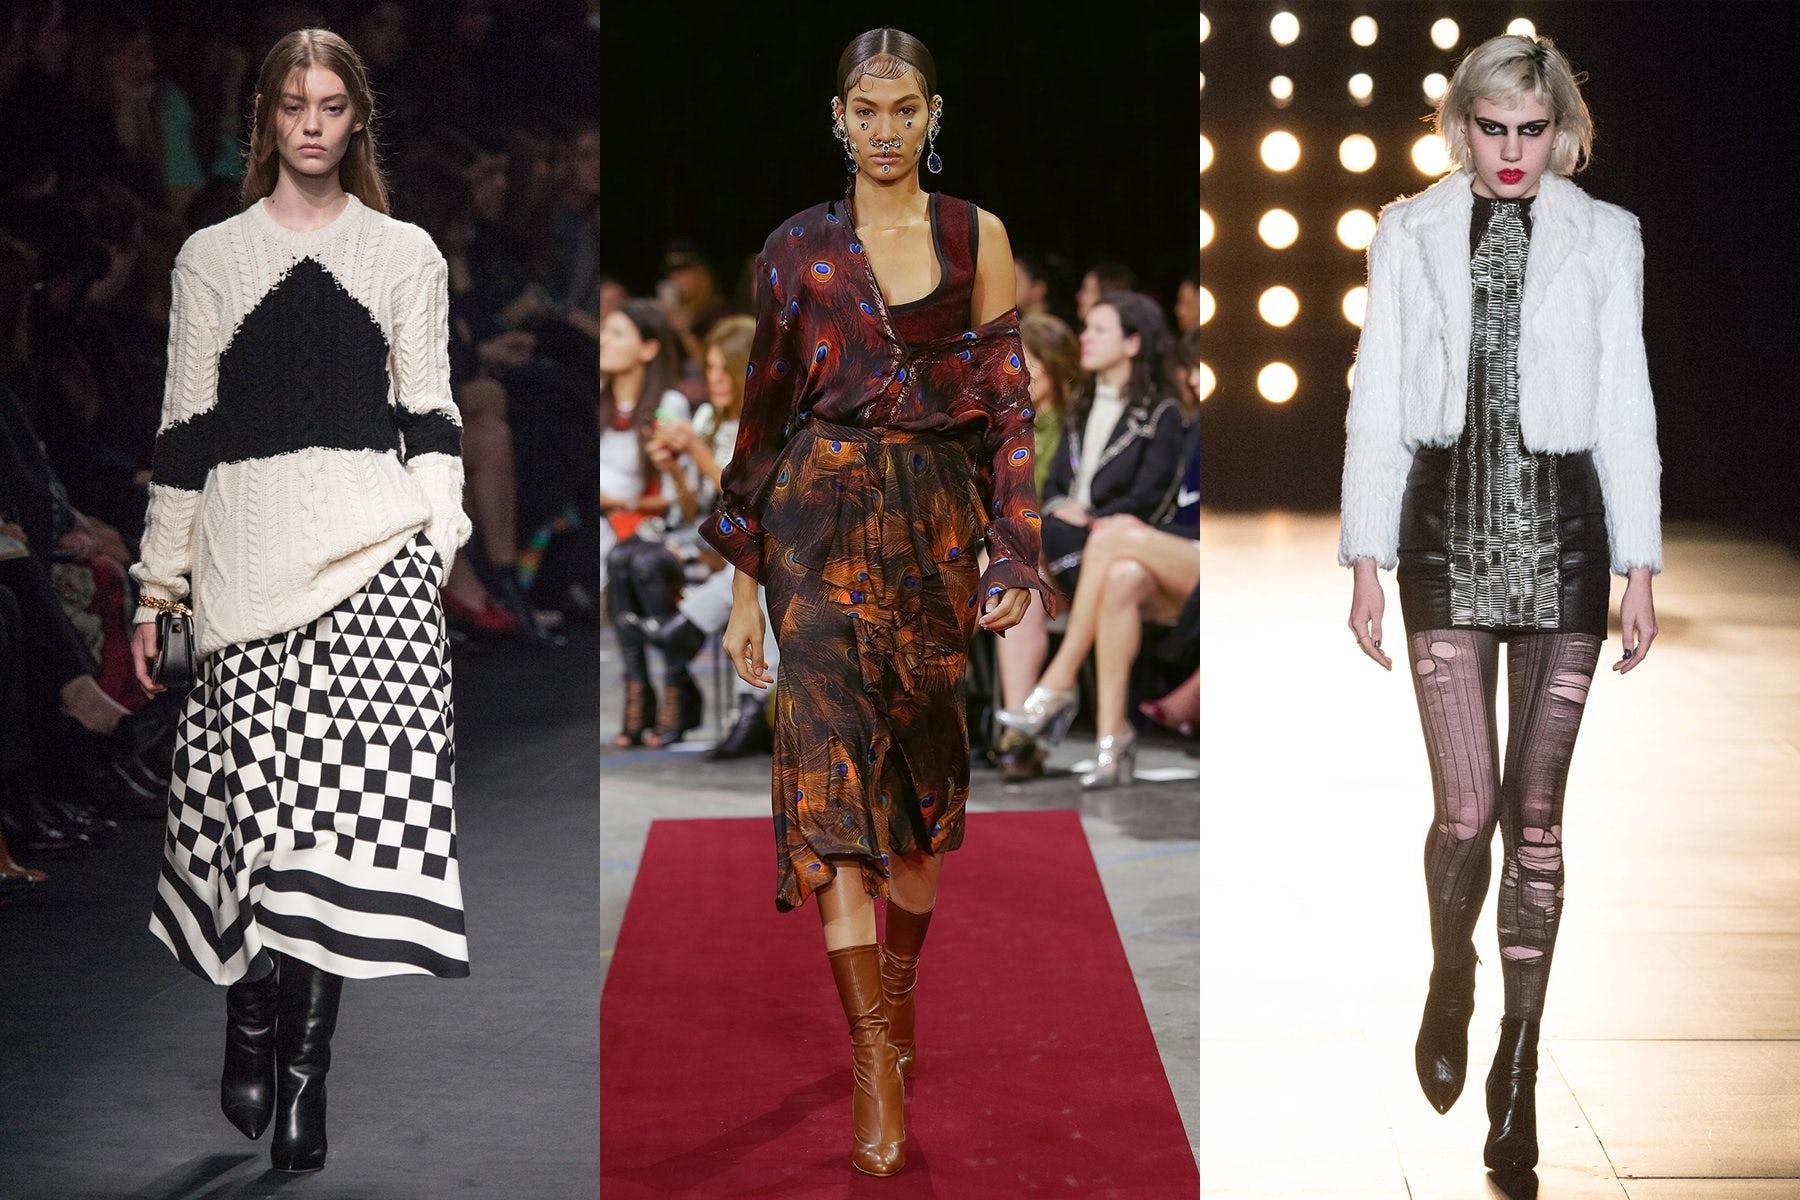 In Era of Image, Stylists Rule Paris